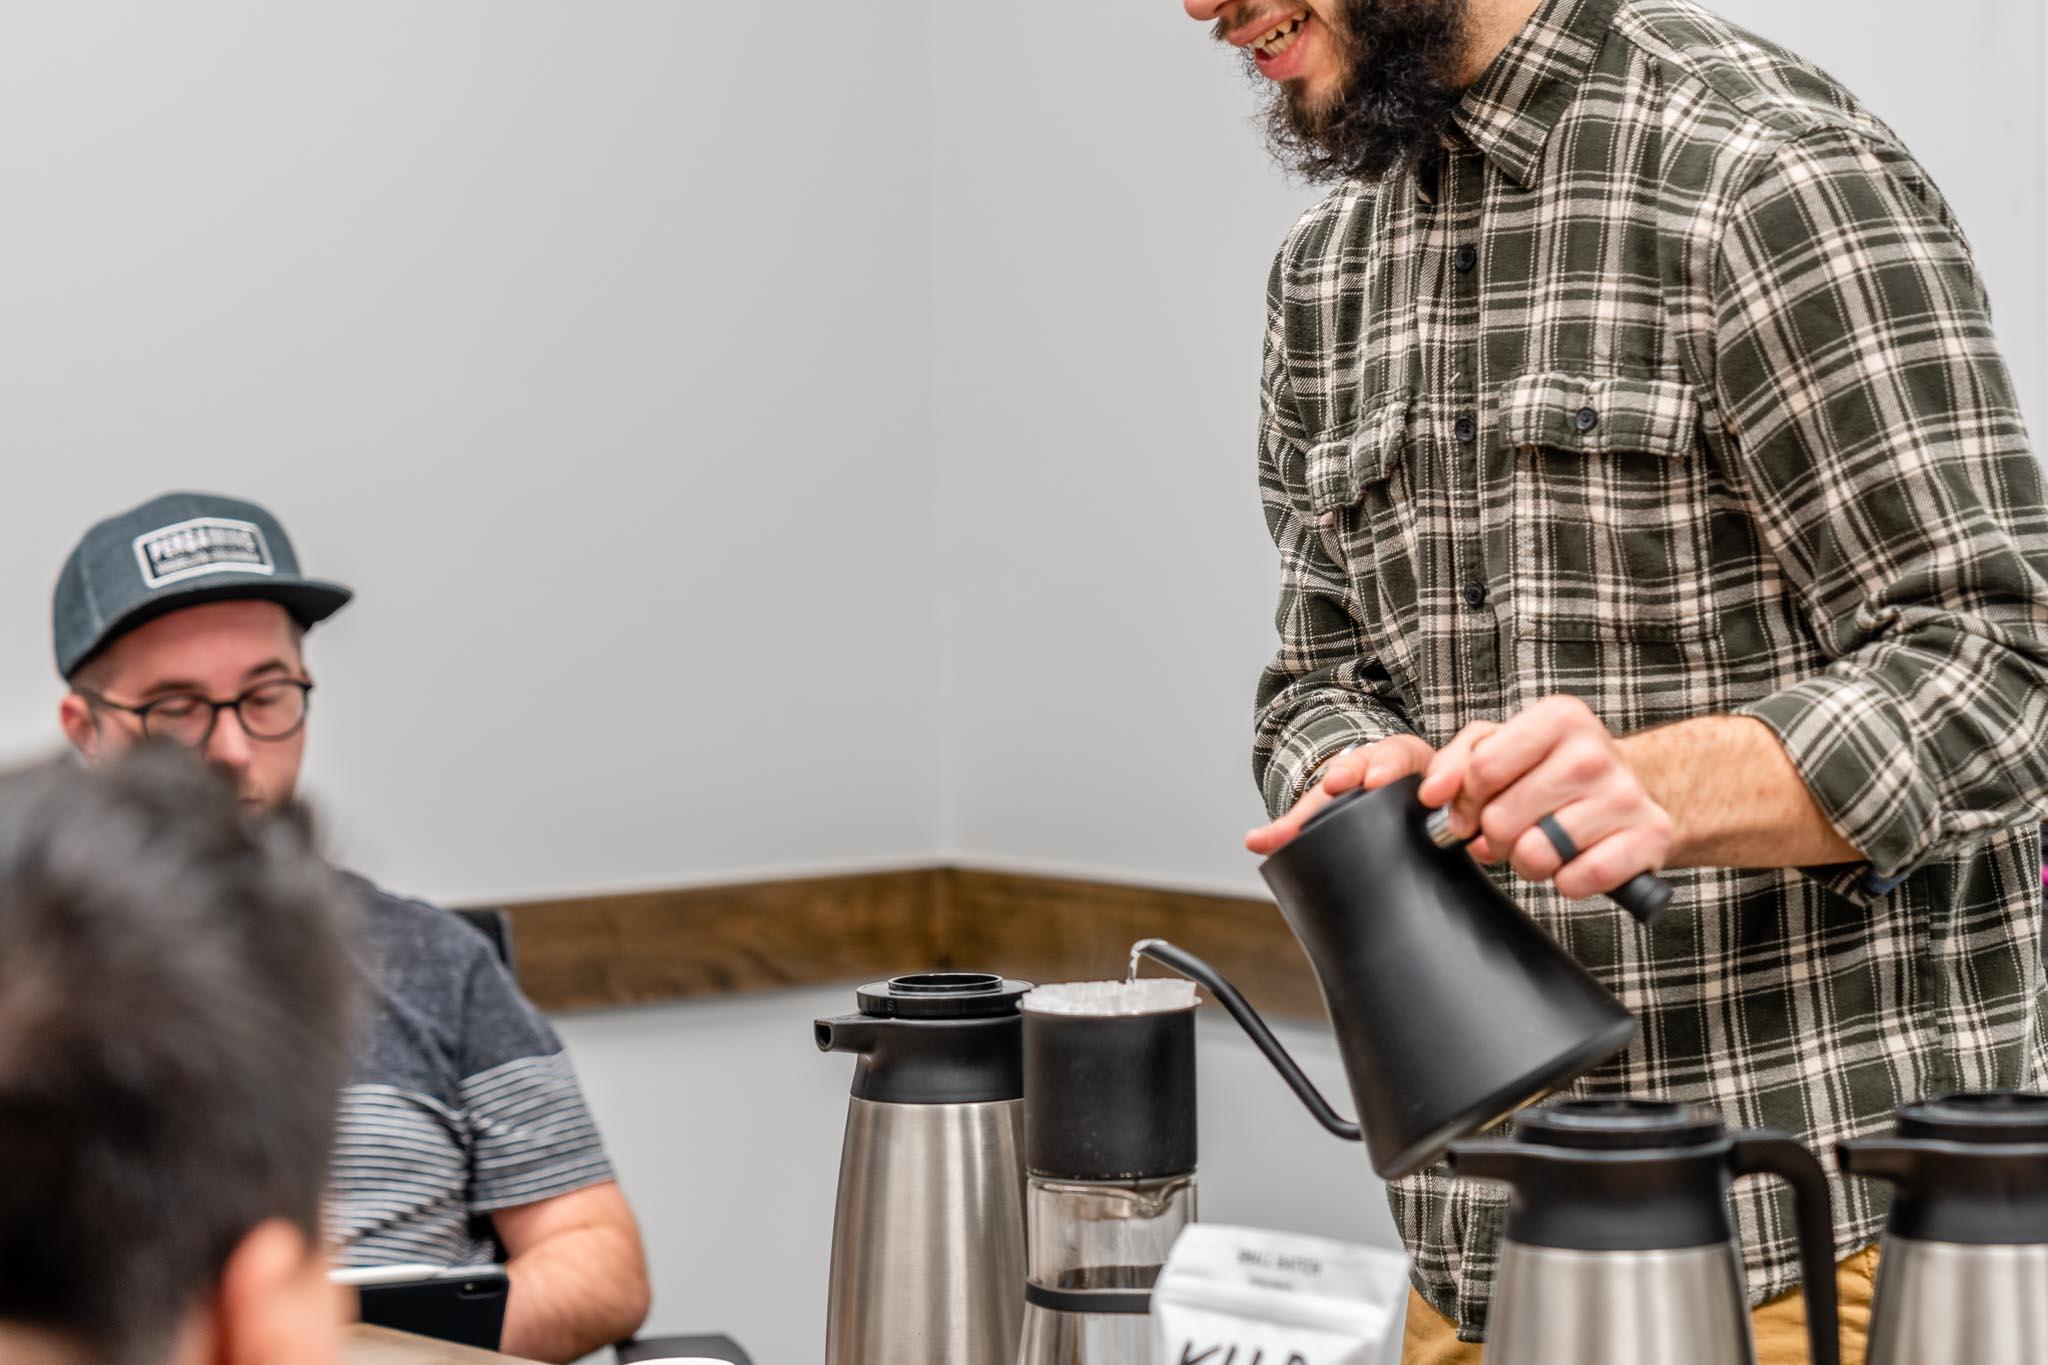 Coffee Class Fellow Kettle Pouring.jpg